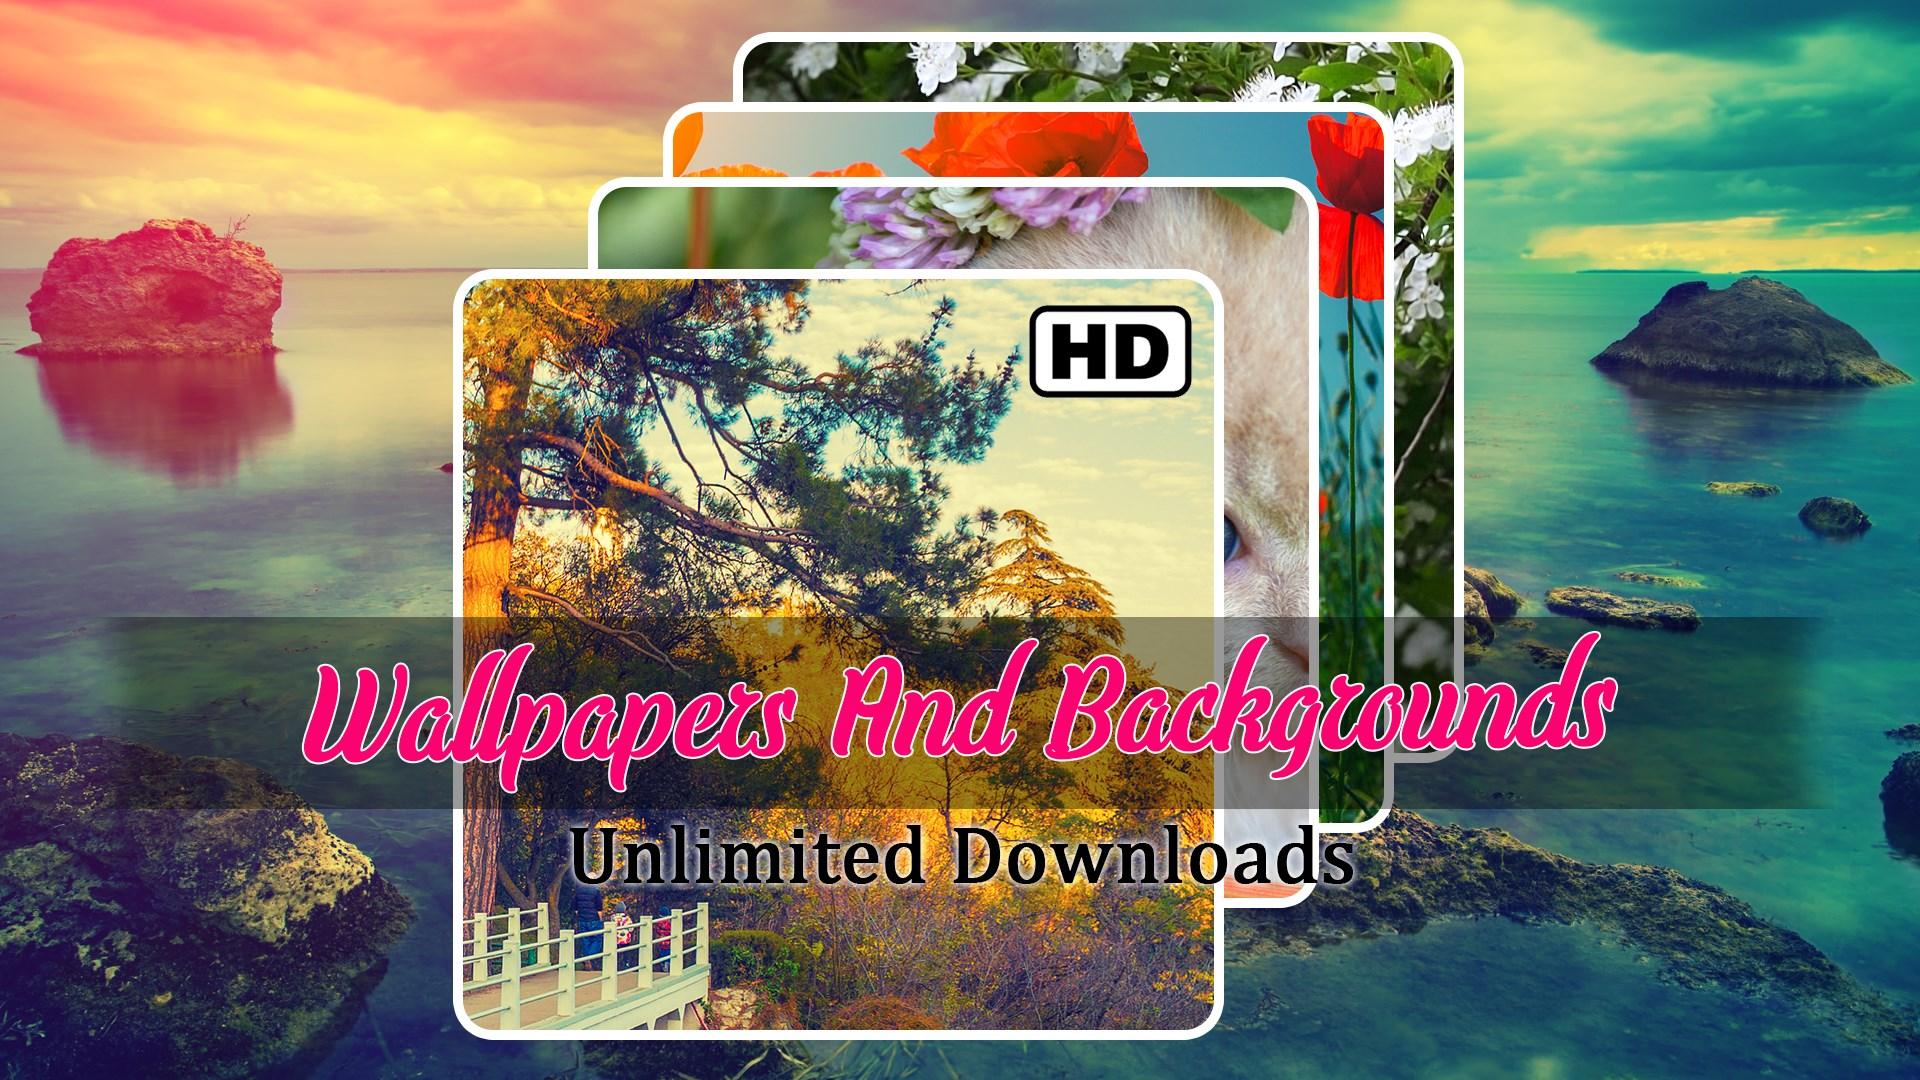 get wallpapers and backgrounds hd splashscreen lockscreen